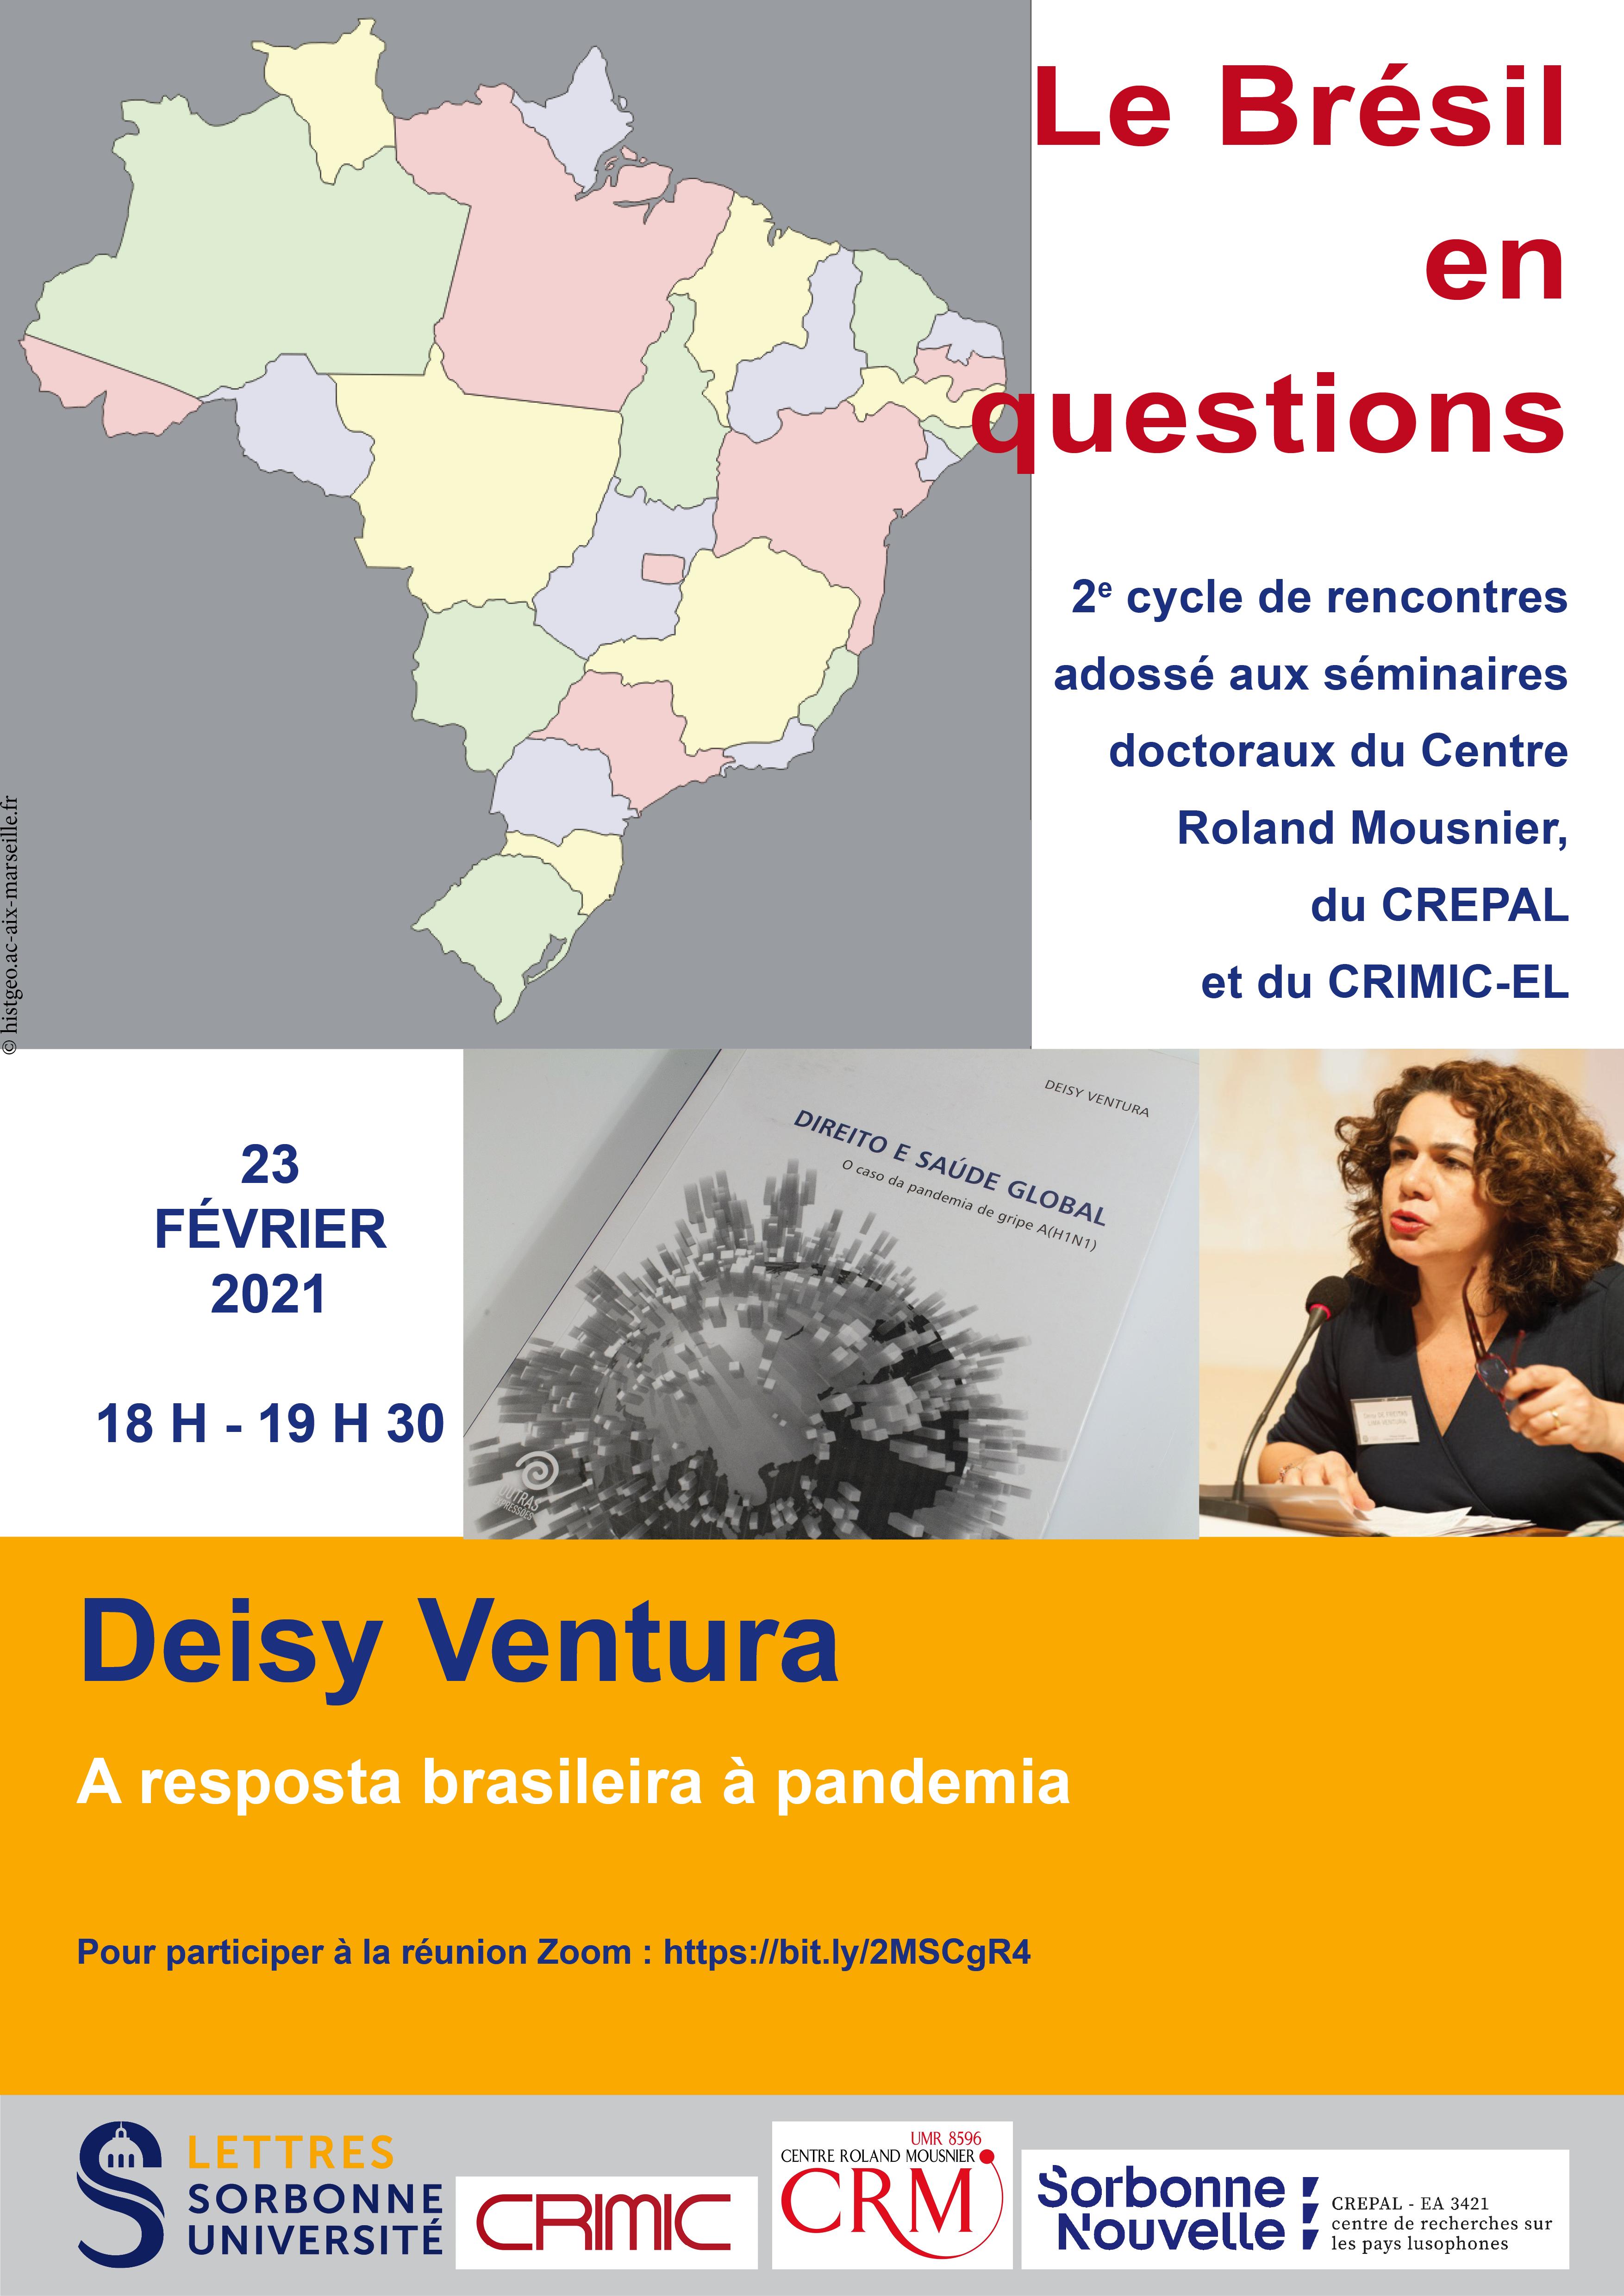 A resposta brasileira à pandemia